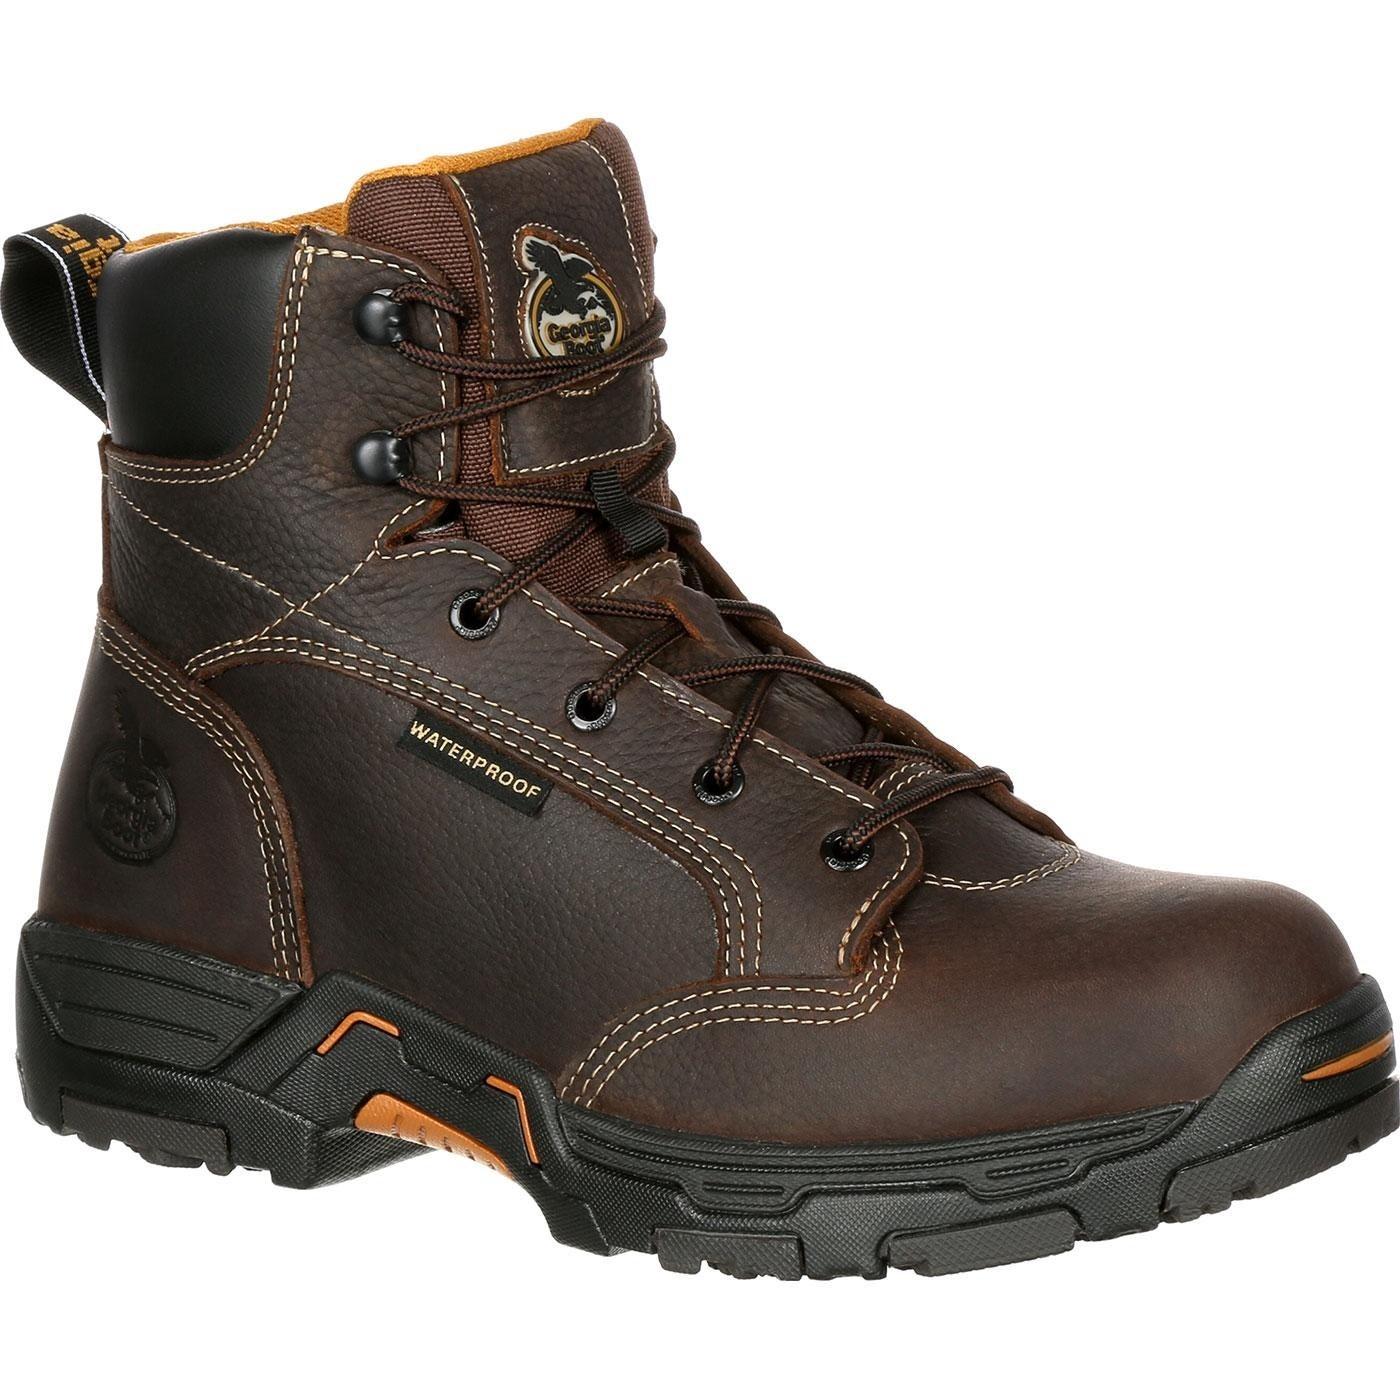 27c22e9701b Buy Size 13 Men's Boots Online at Overstock   Our Best Men's Shoes Deals